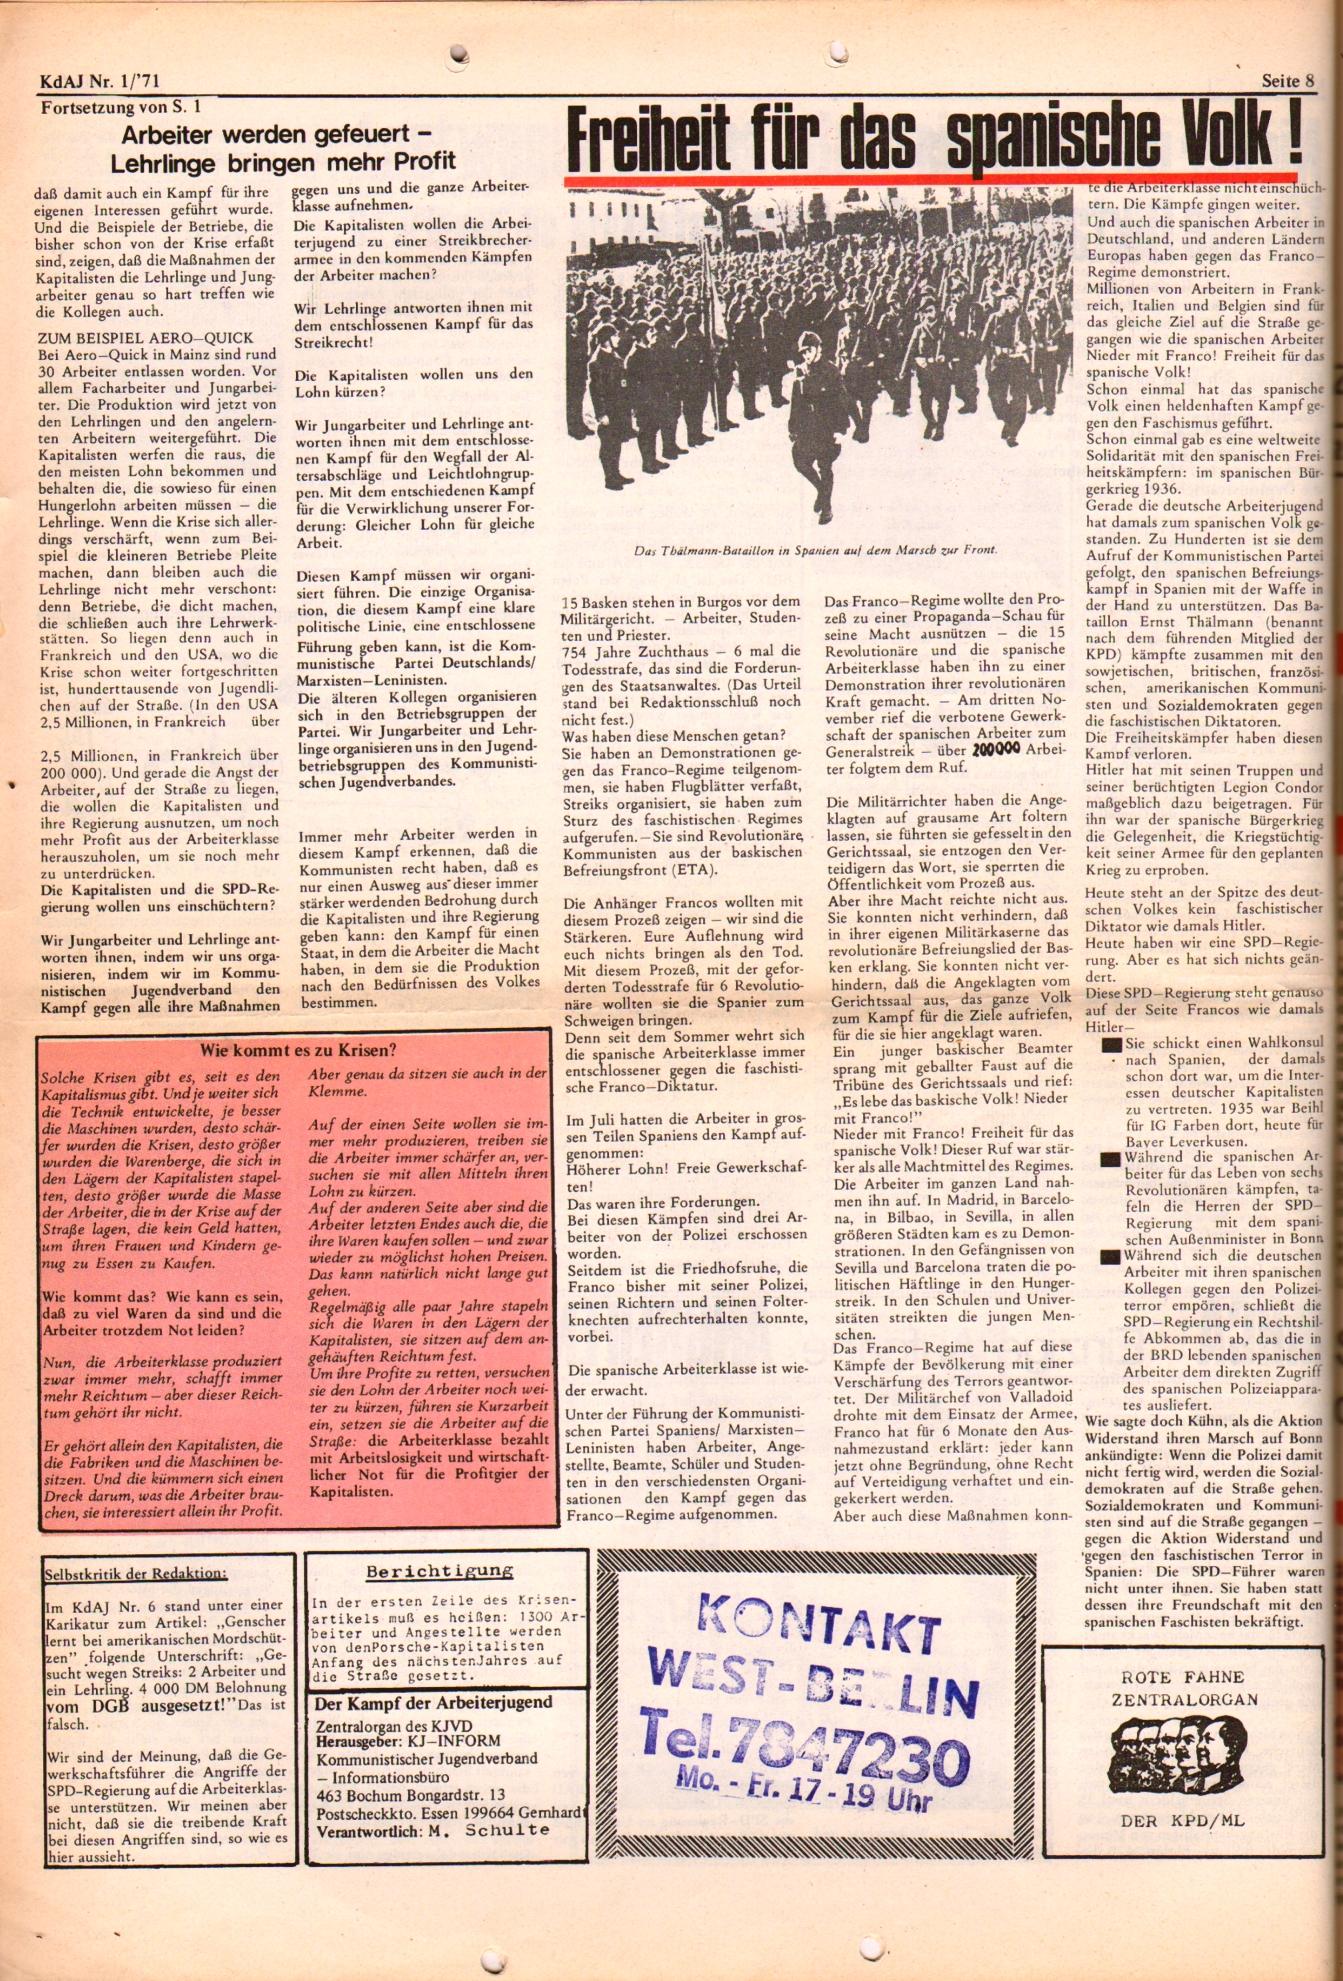 KDAJ, 2. Jg., Januar 1971, Nr. 1, Seite 8